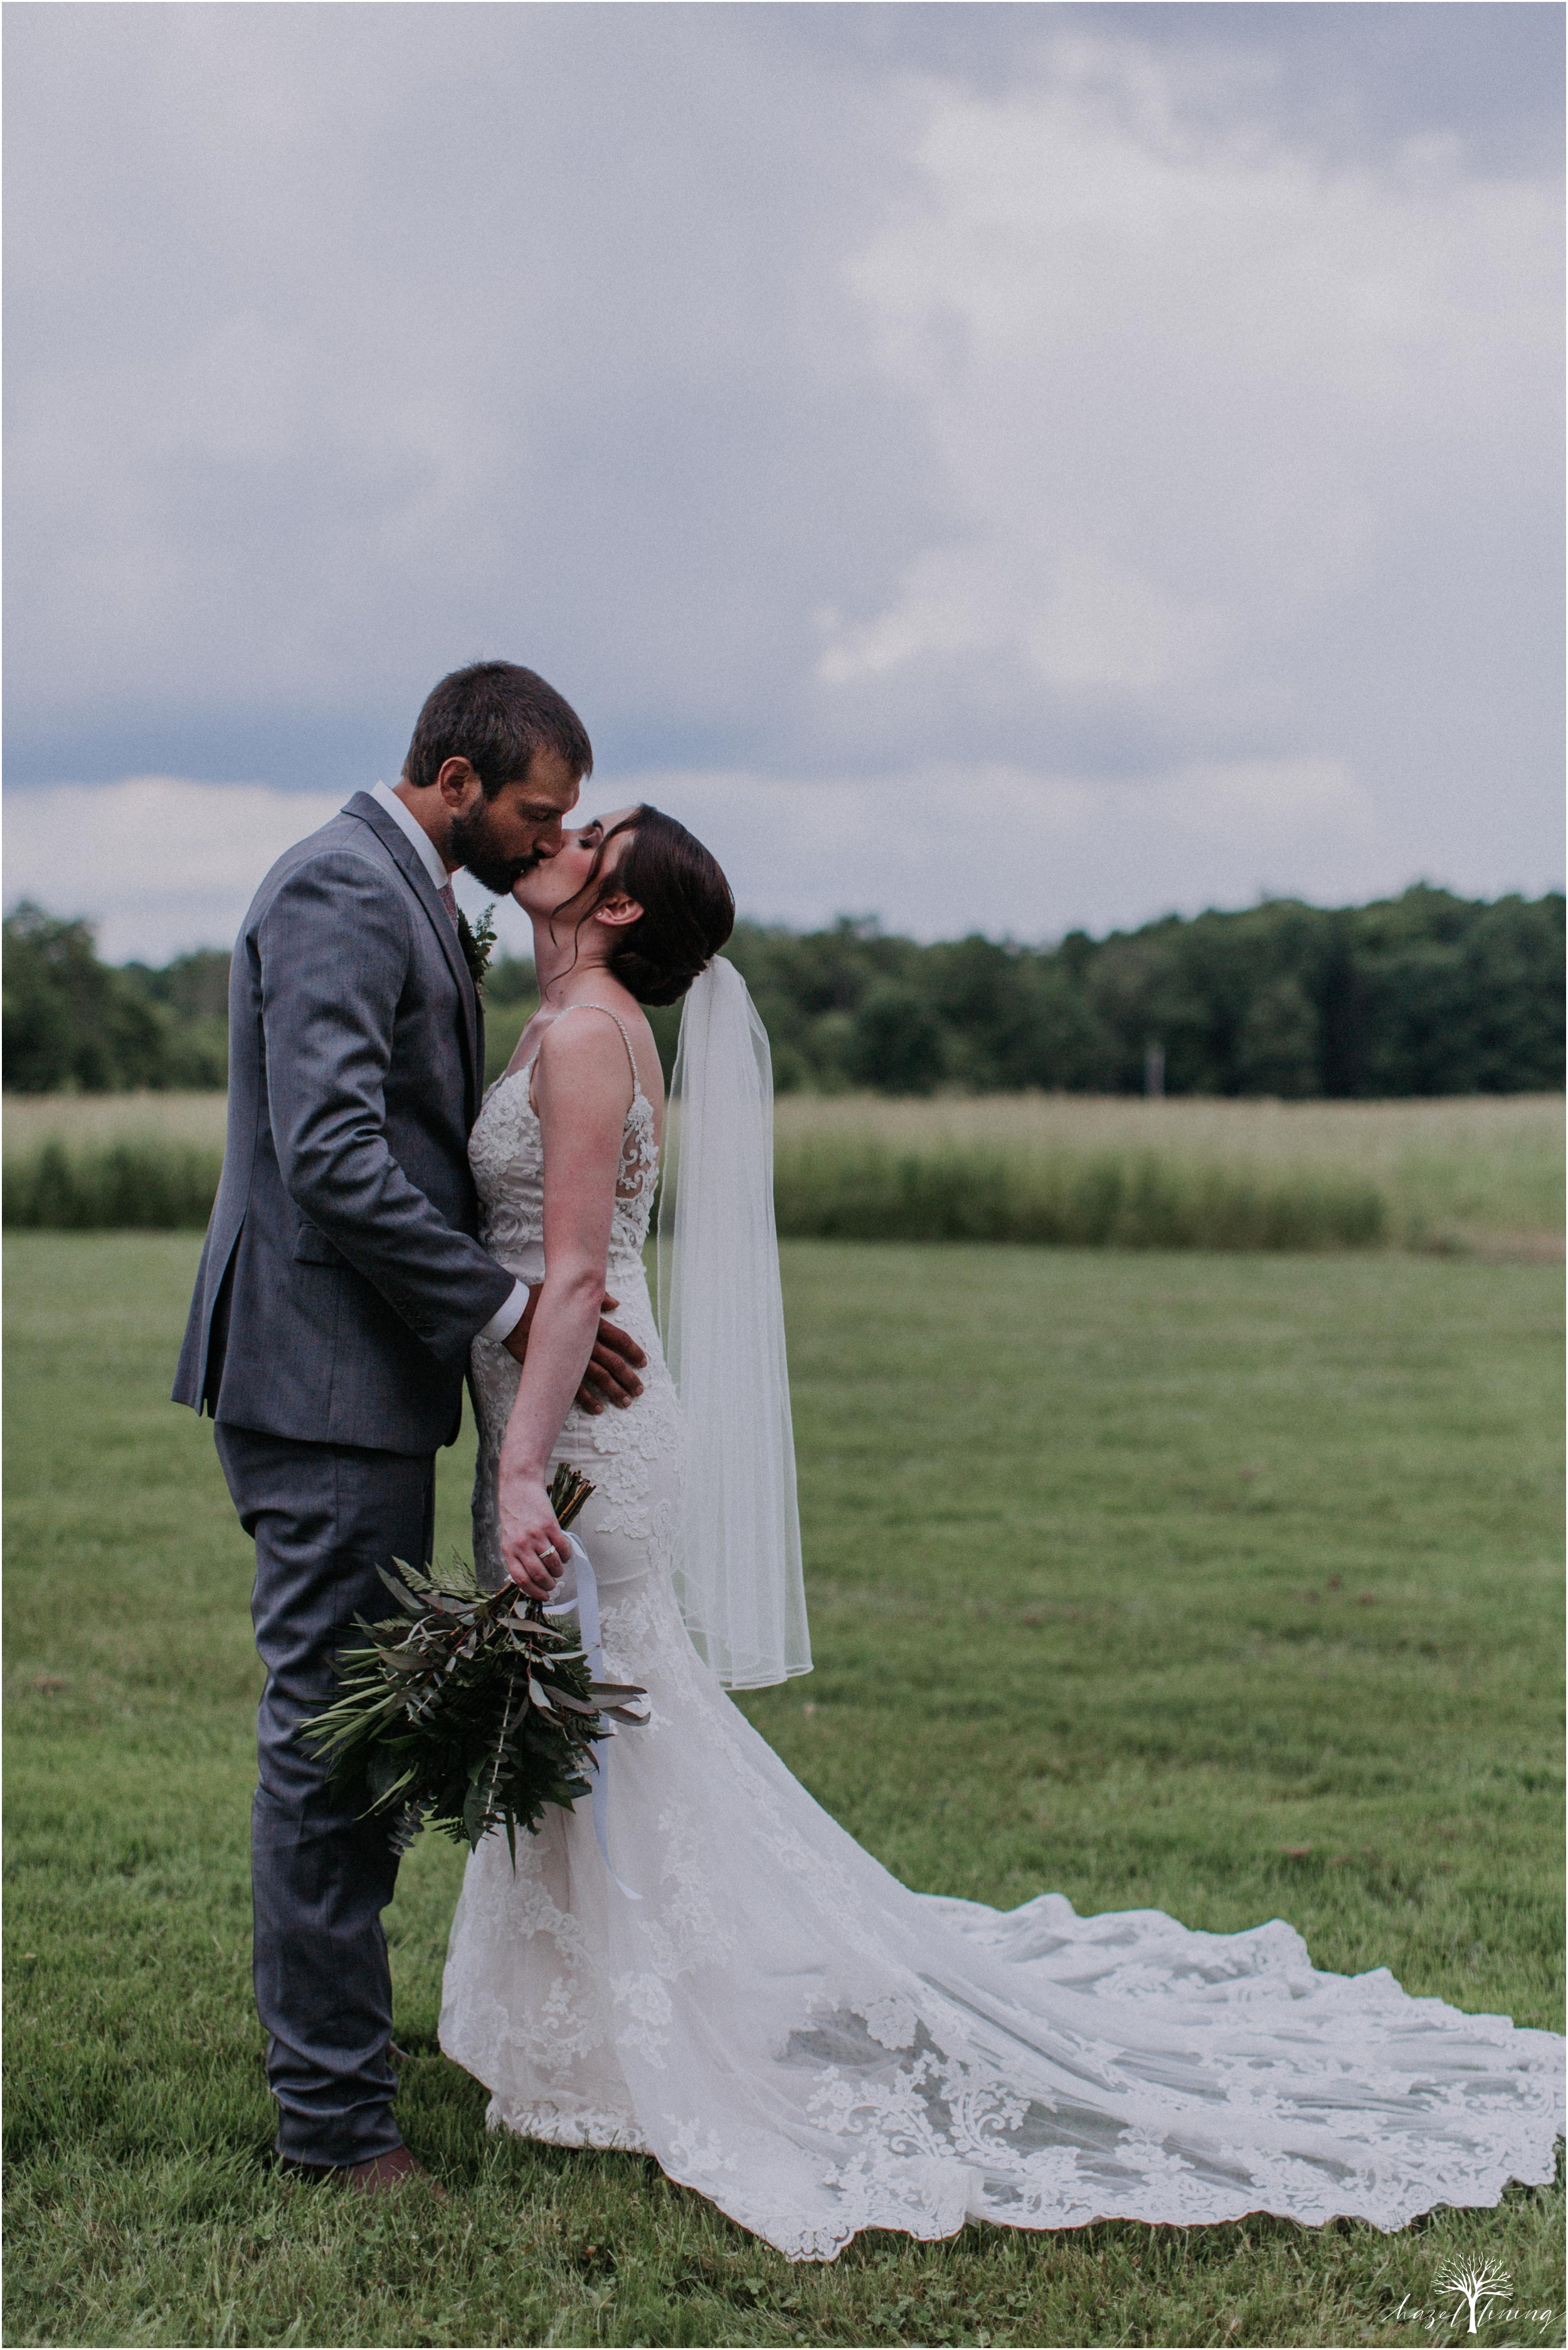 hazel-lining-travel-wedding-elopement-photography-lisa-landon-shoemaker-the-farm-bakery-and-events-bucks-county-quakertown-pennsylvania-summer-country-outdoor-farm-wedding_0086.jpg